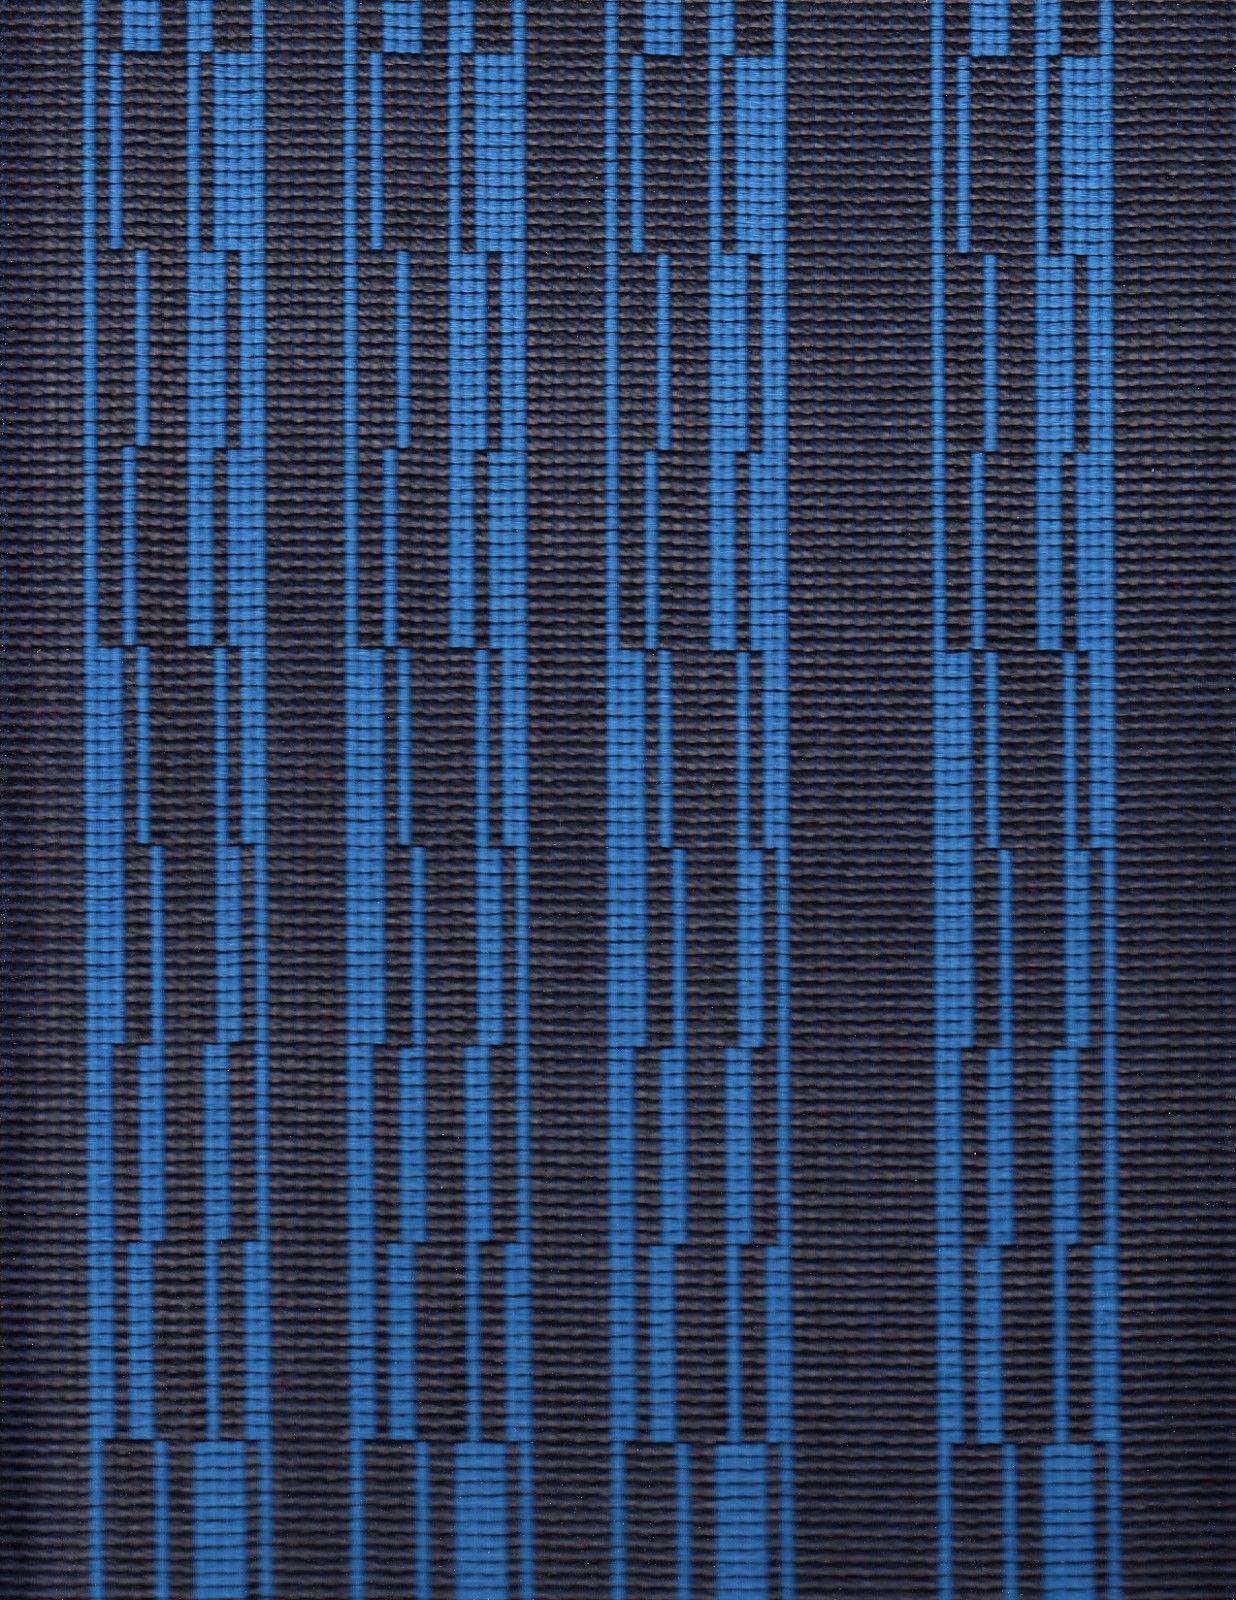 5.125 yds Architex Upholstery Fabric Geometric Progress Beluga Charcoal/Blue Y